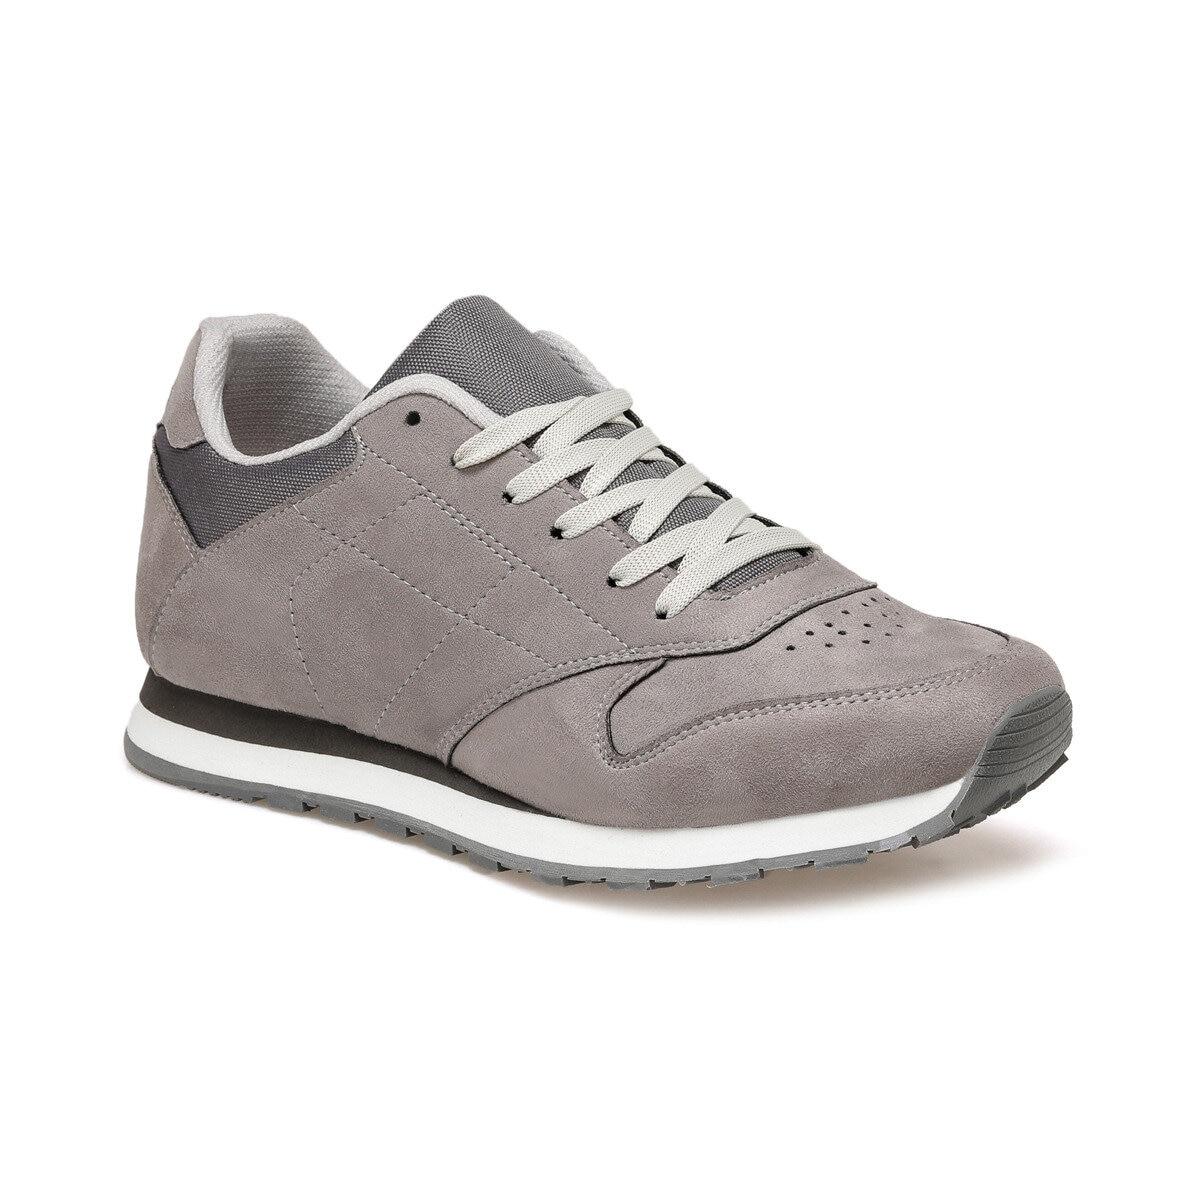 FLO MUMBAI Mink Male Sneaker Shoes KINETIX